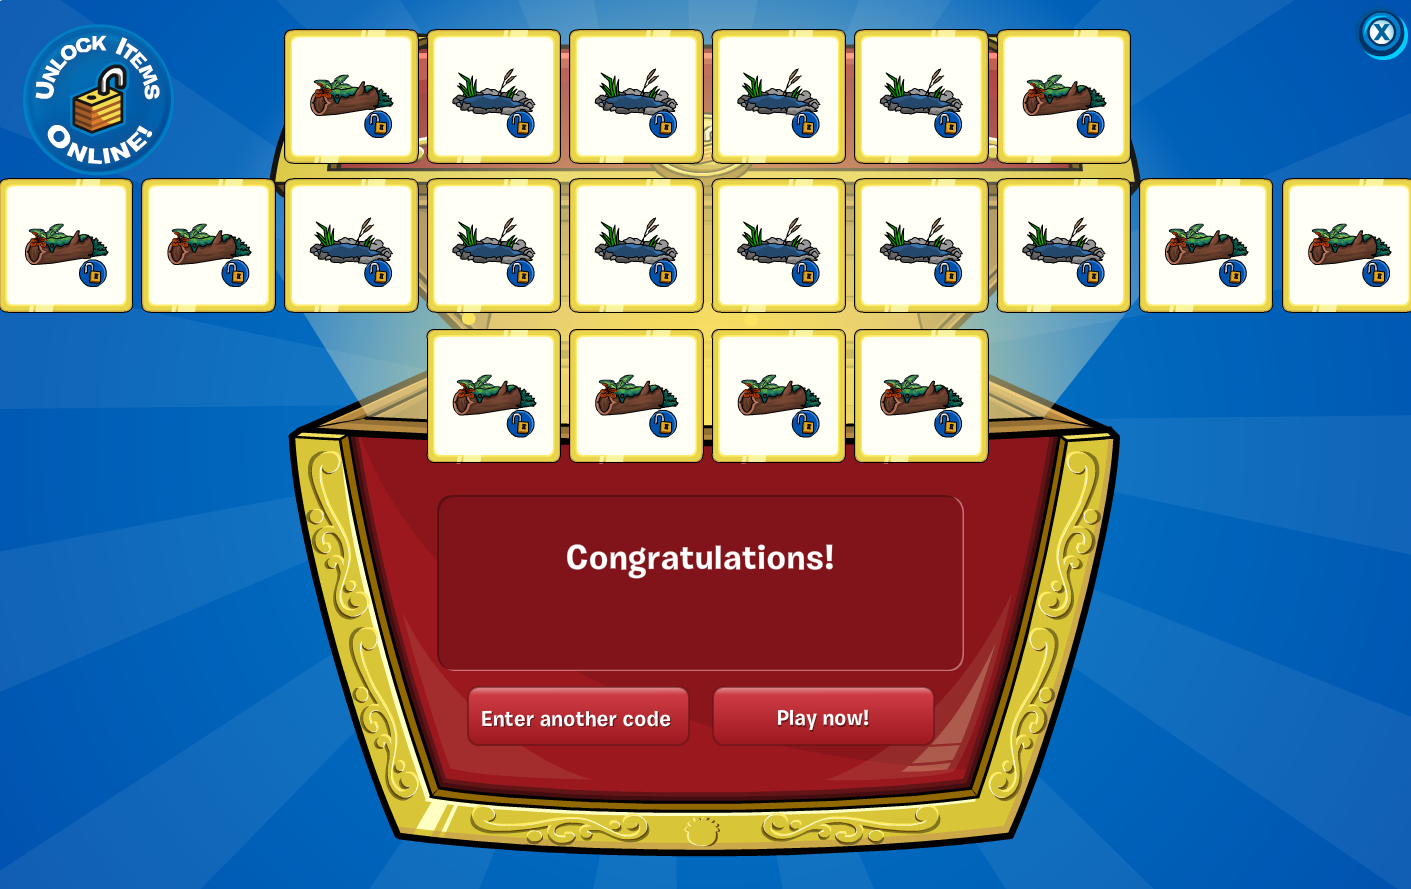 Club Penguin Codes: Unlock 20 Free Furniture Items!